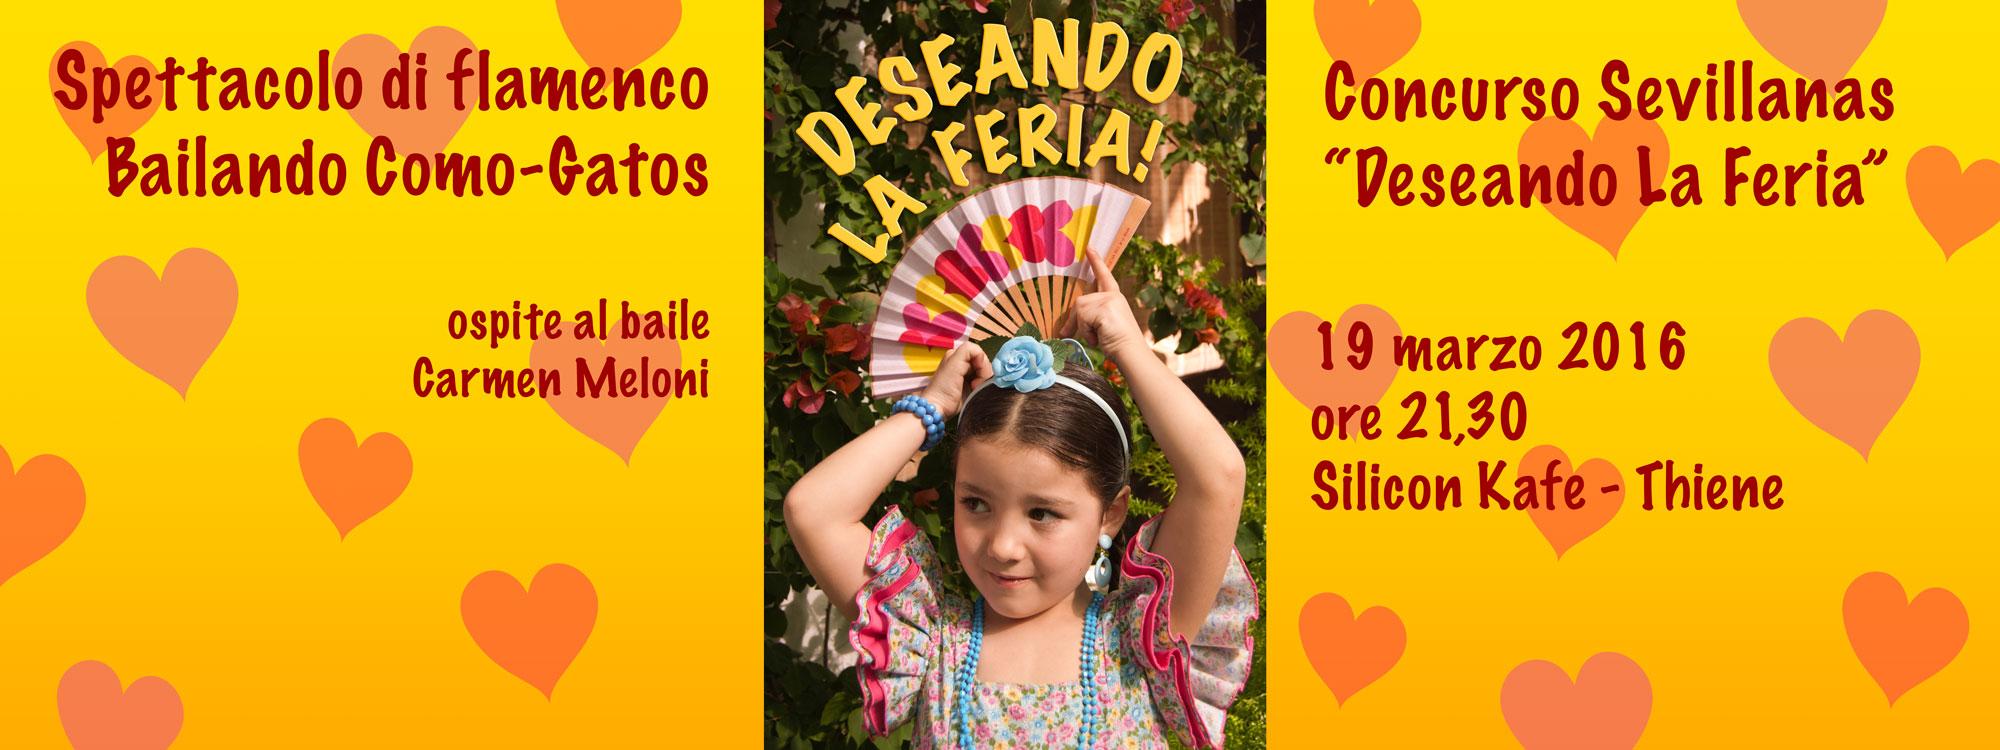 """Deseando la Feria"" Concurso Sevillanas foto"